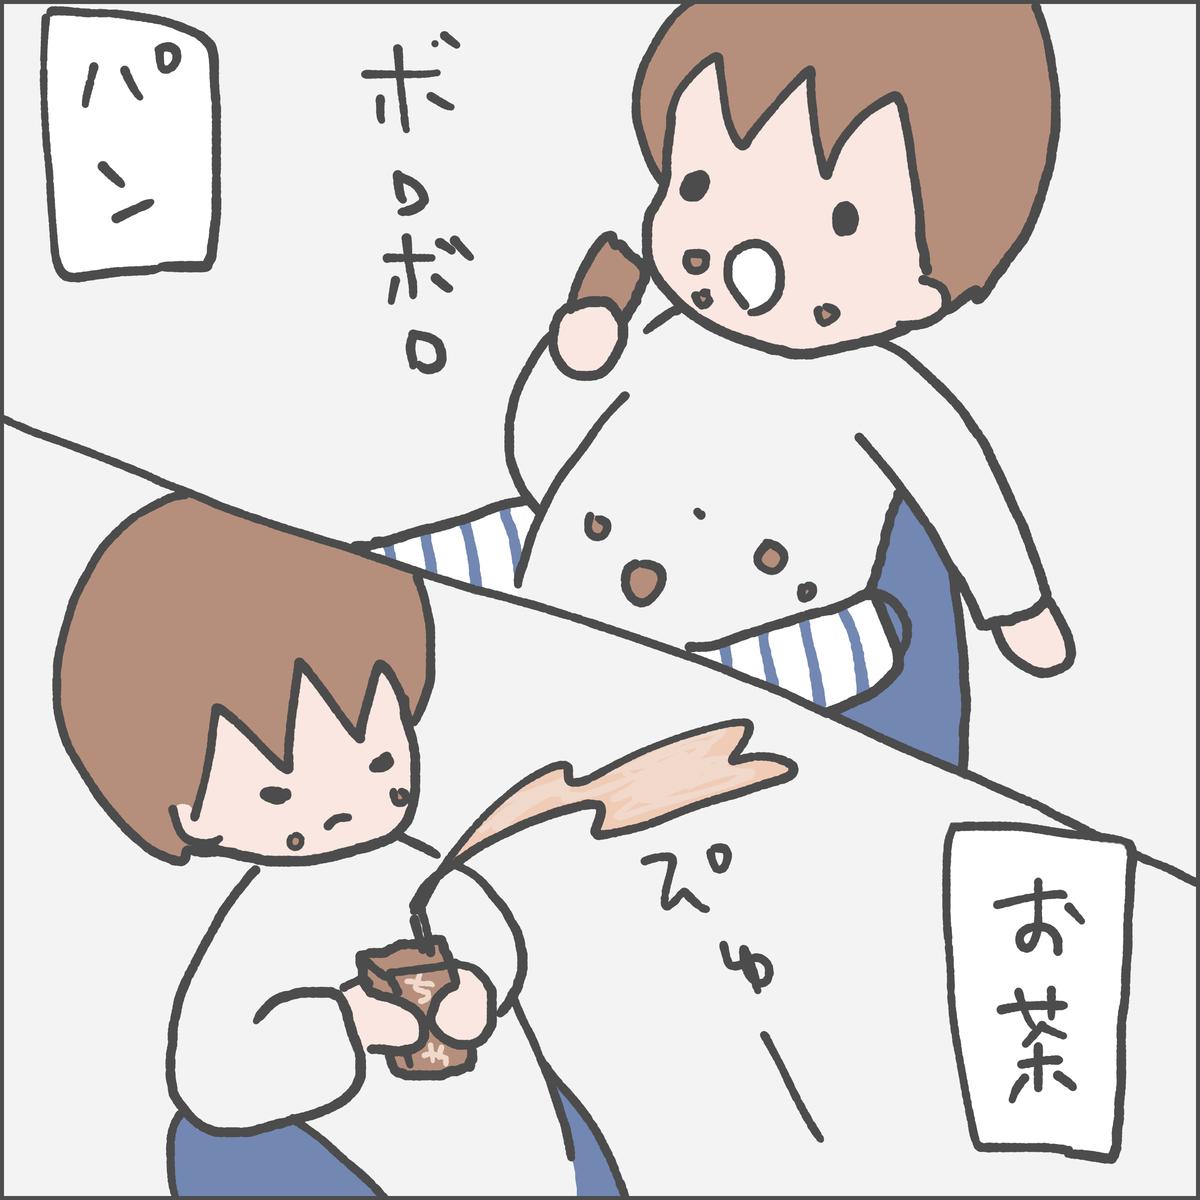 f:id:ika_yoshi:20210429032907j:plain